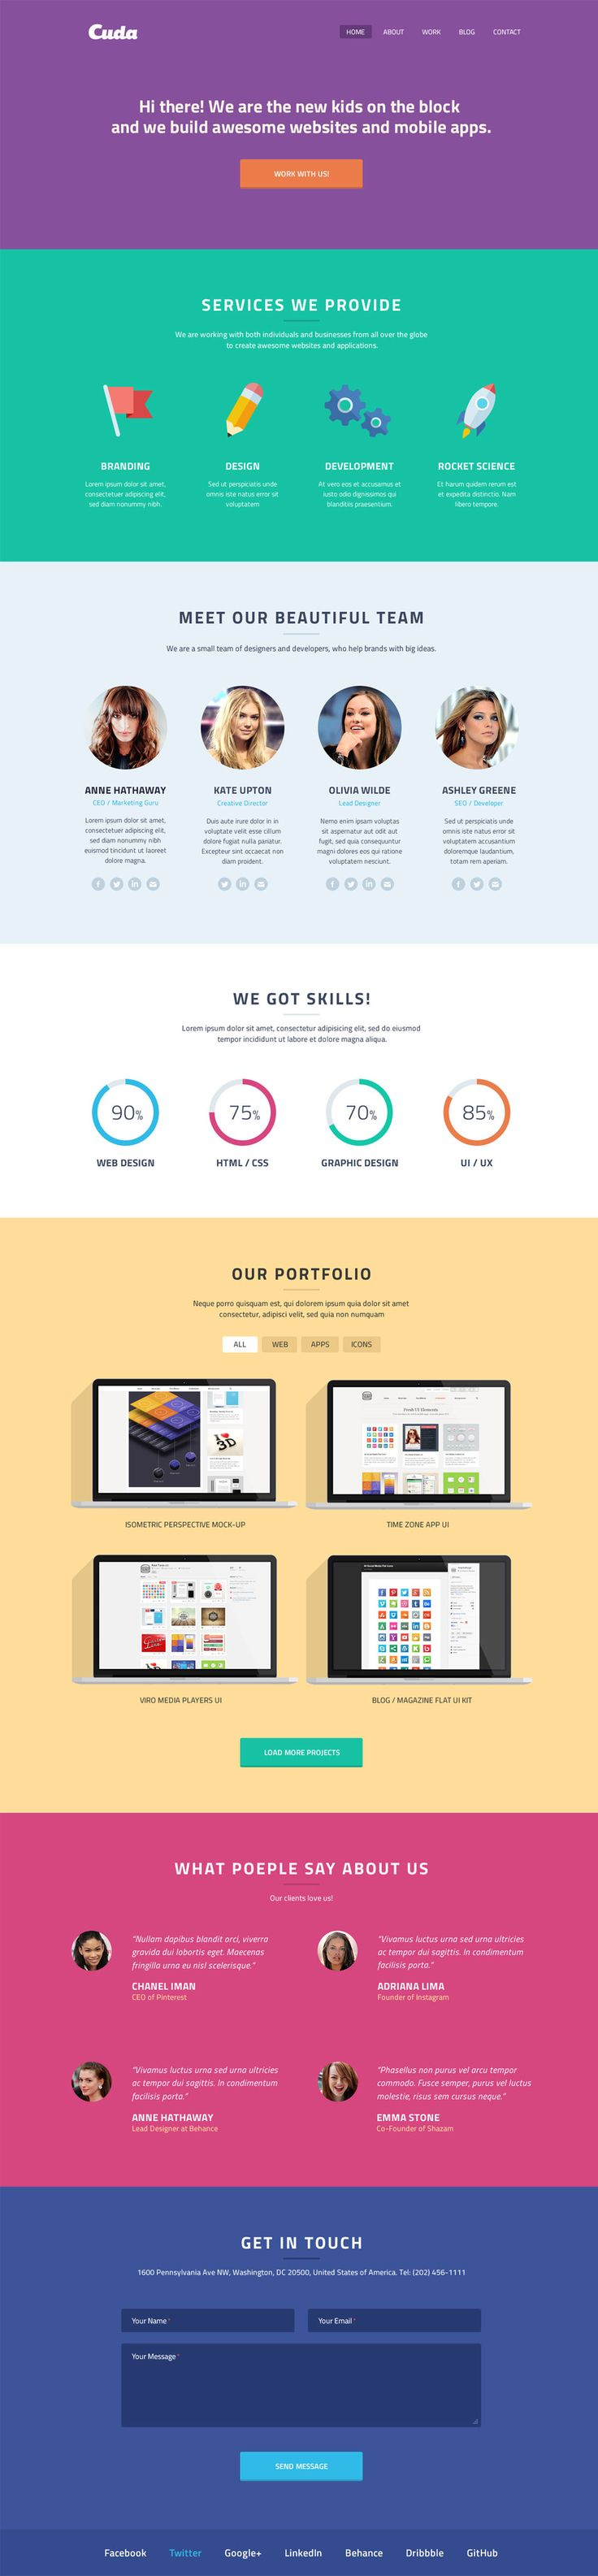 Best 25+ Free web page templates ideas on Pinterest | Html pattern ...